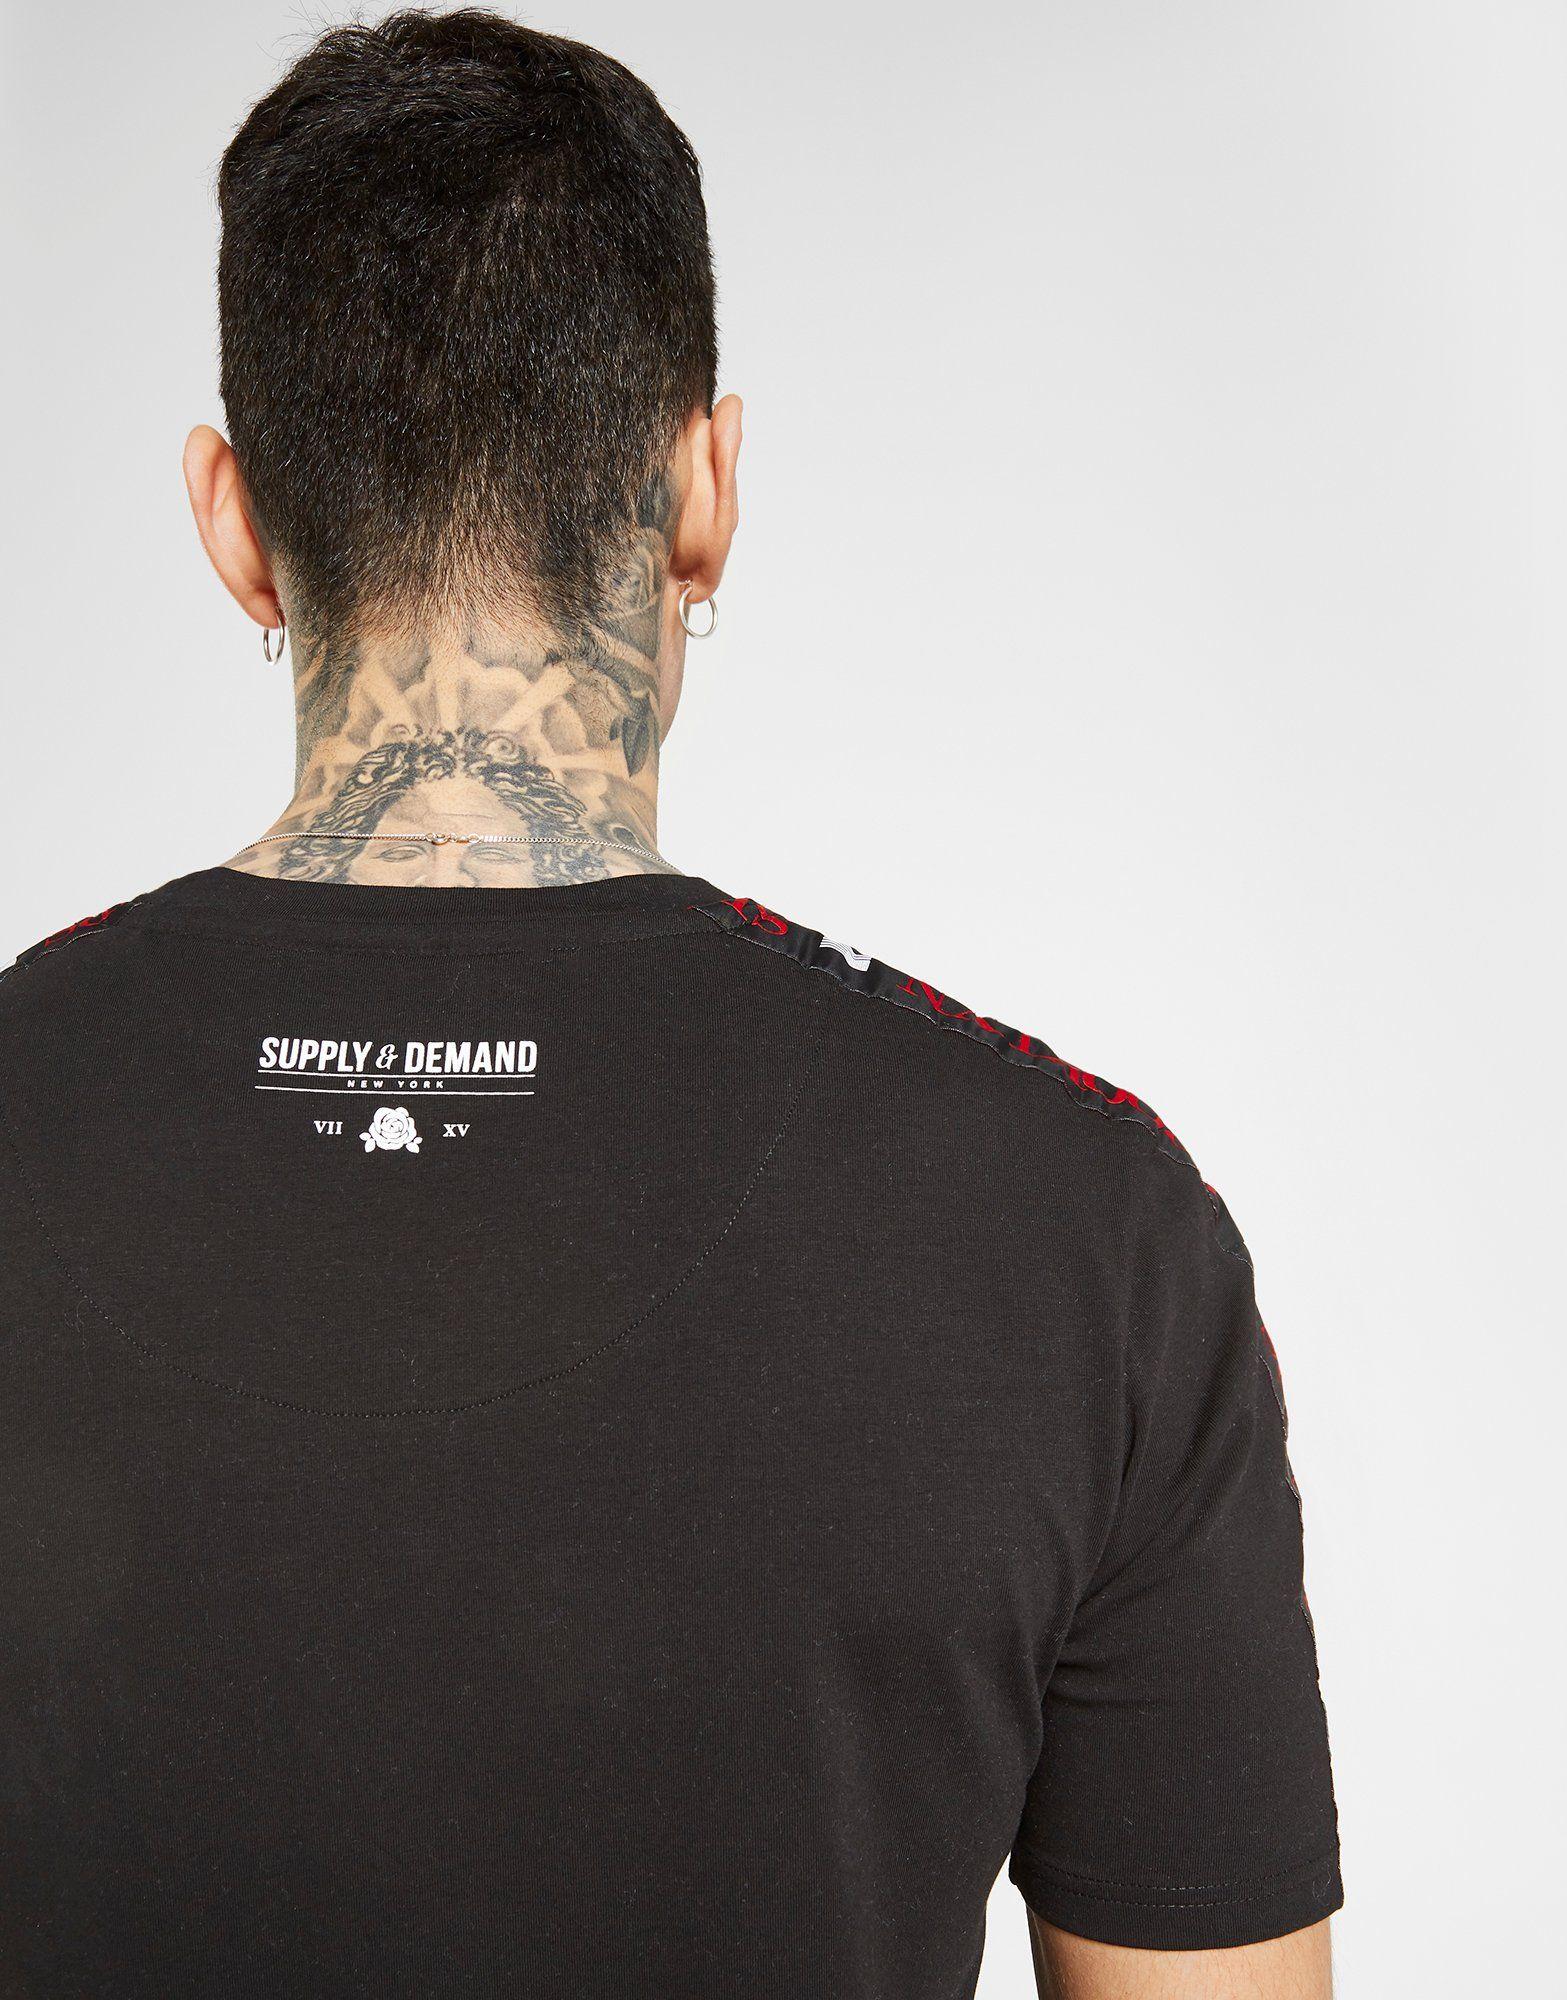 Supply & Demand Limited T-Shirt